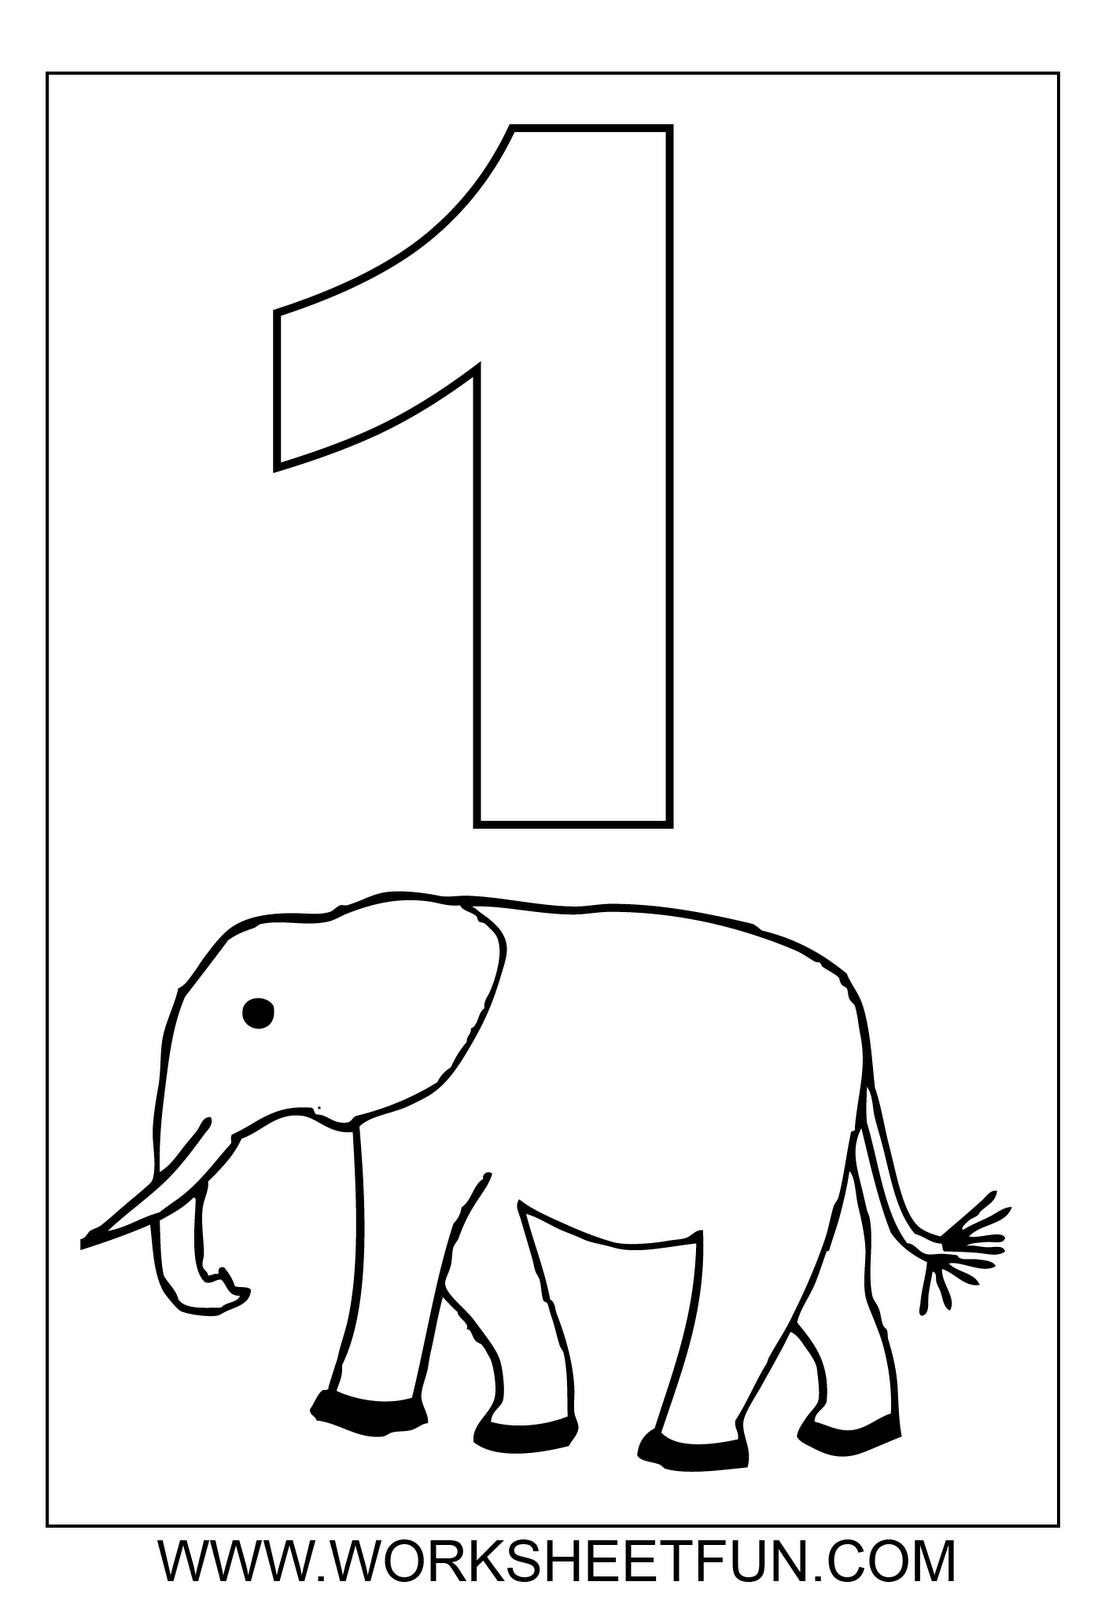 Coloring Pages For Number 1. Free Printable Worksheets  Number Coloring Pages Cijferkaarten om te printen 1 t da Pinterest